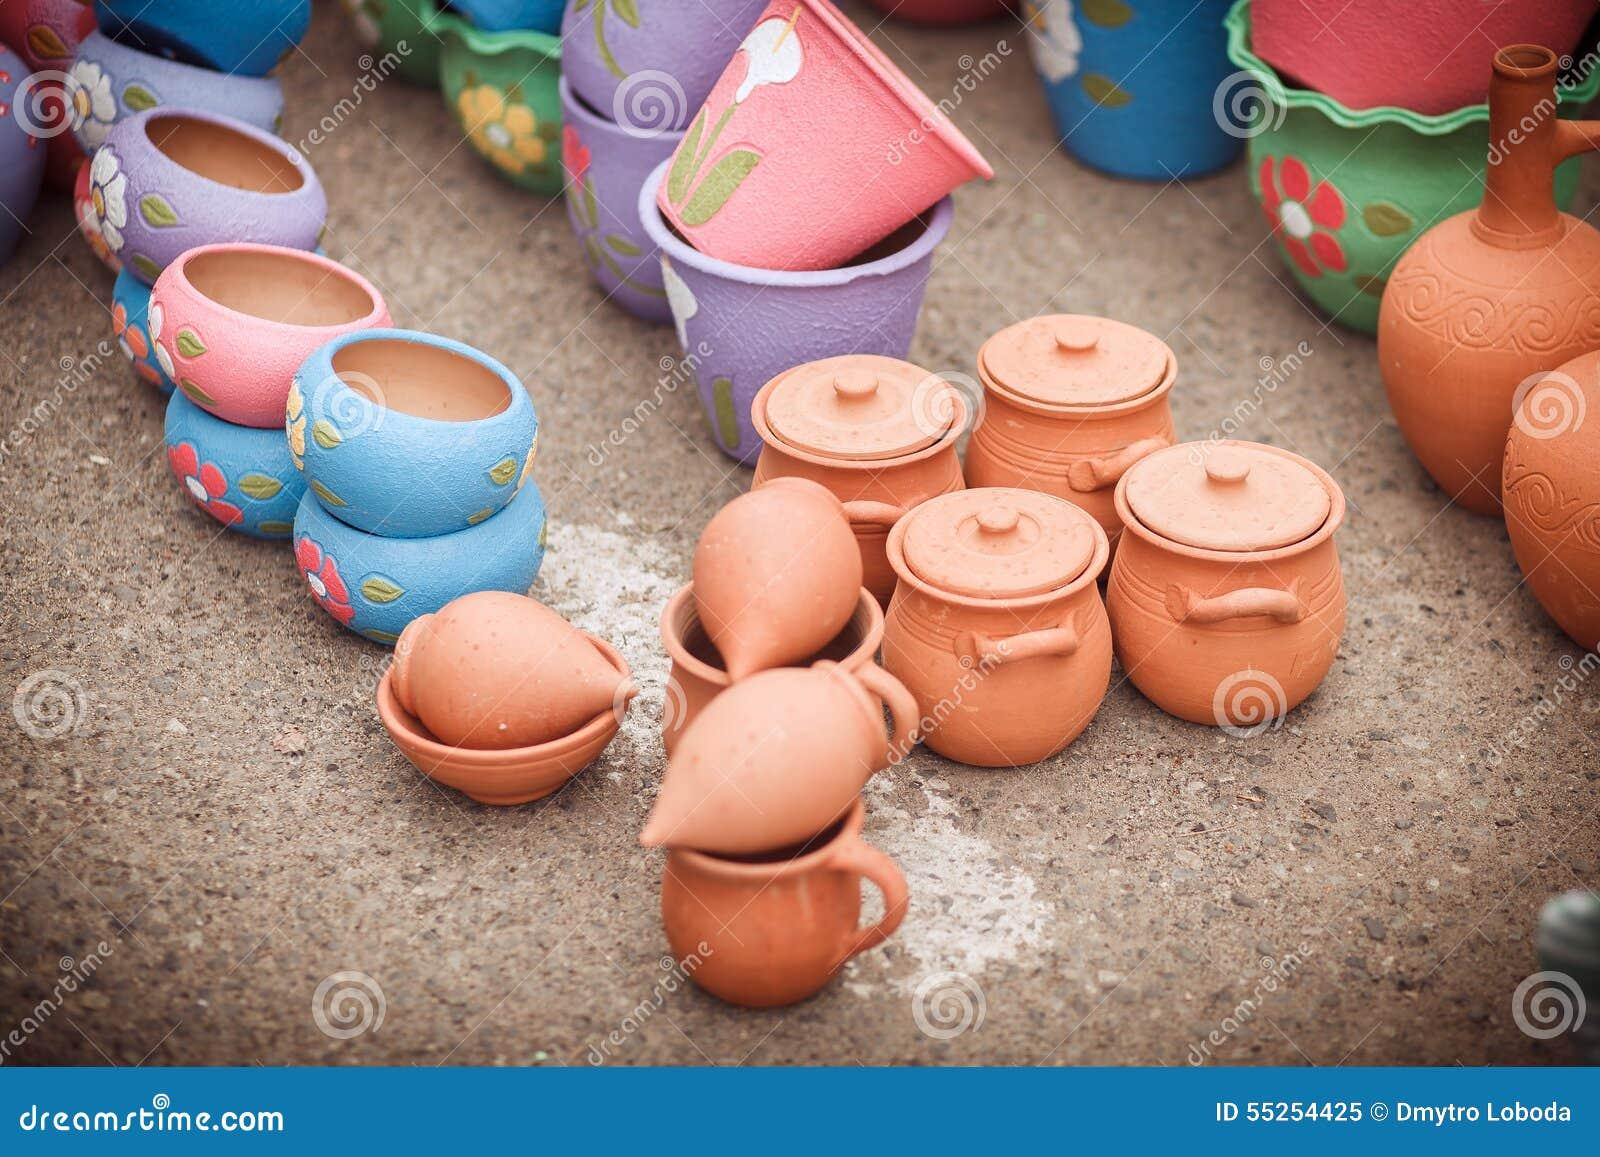 Market, clay pots